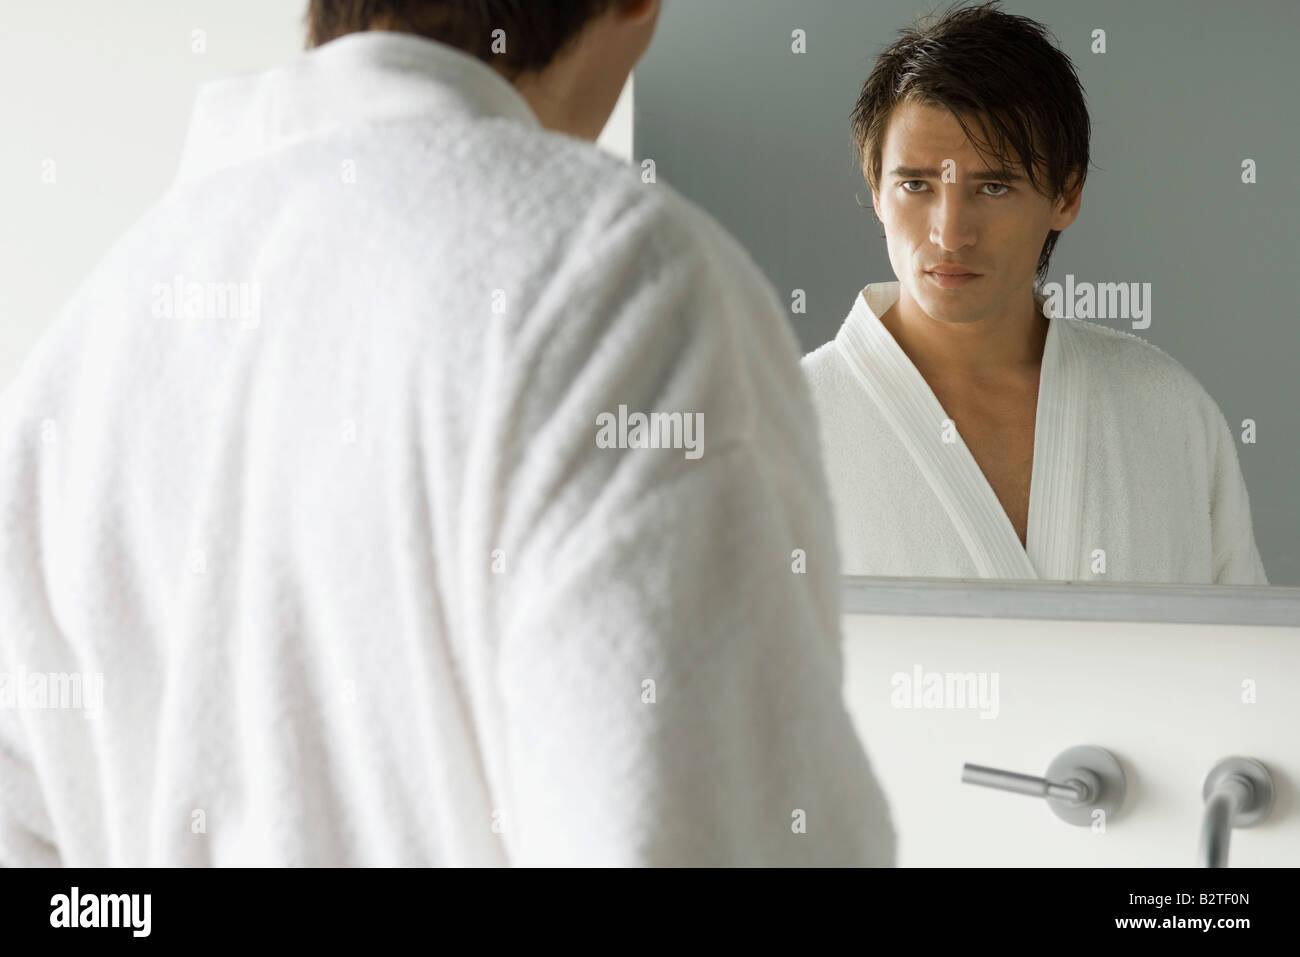 Man looking at himself in mirror, wearing bathrobe, furrowing brow - Stock Image